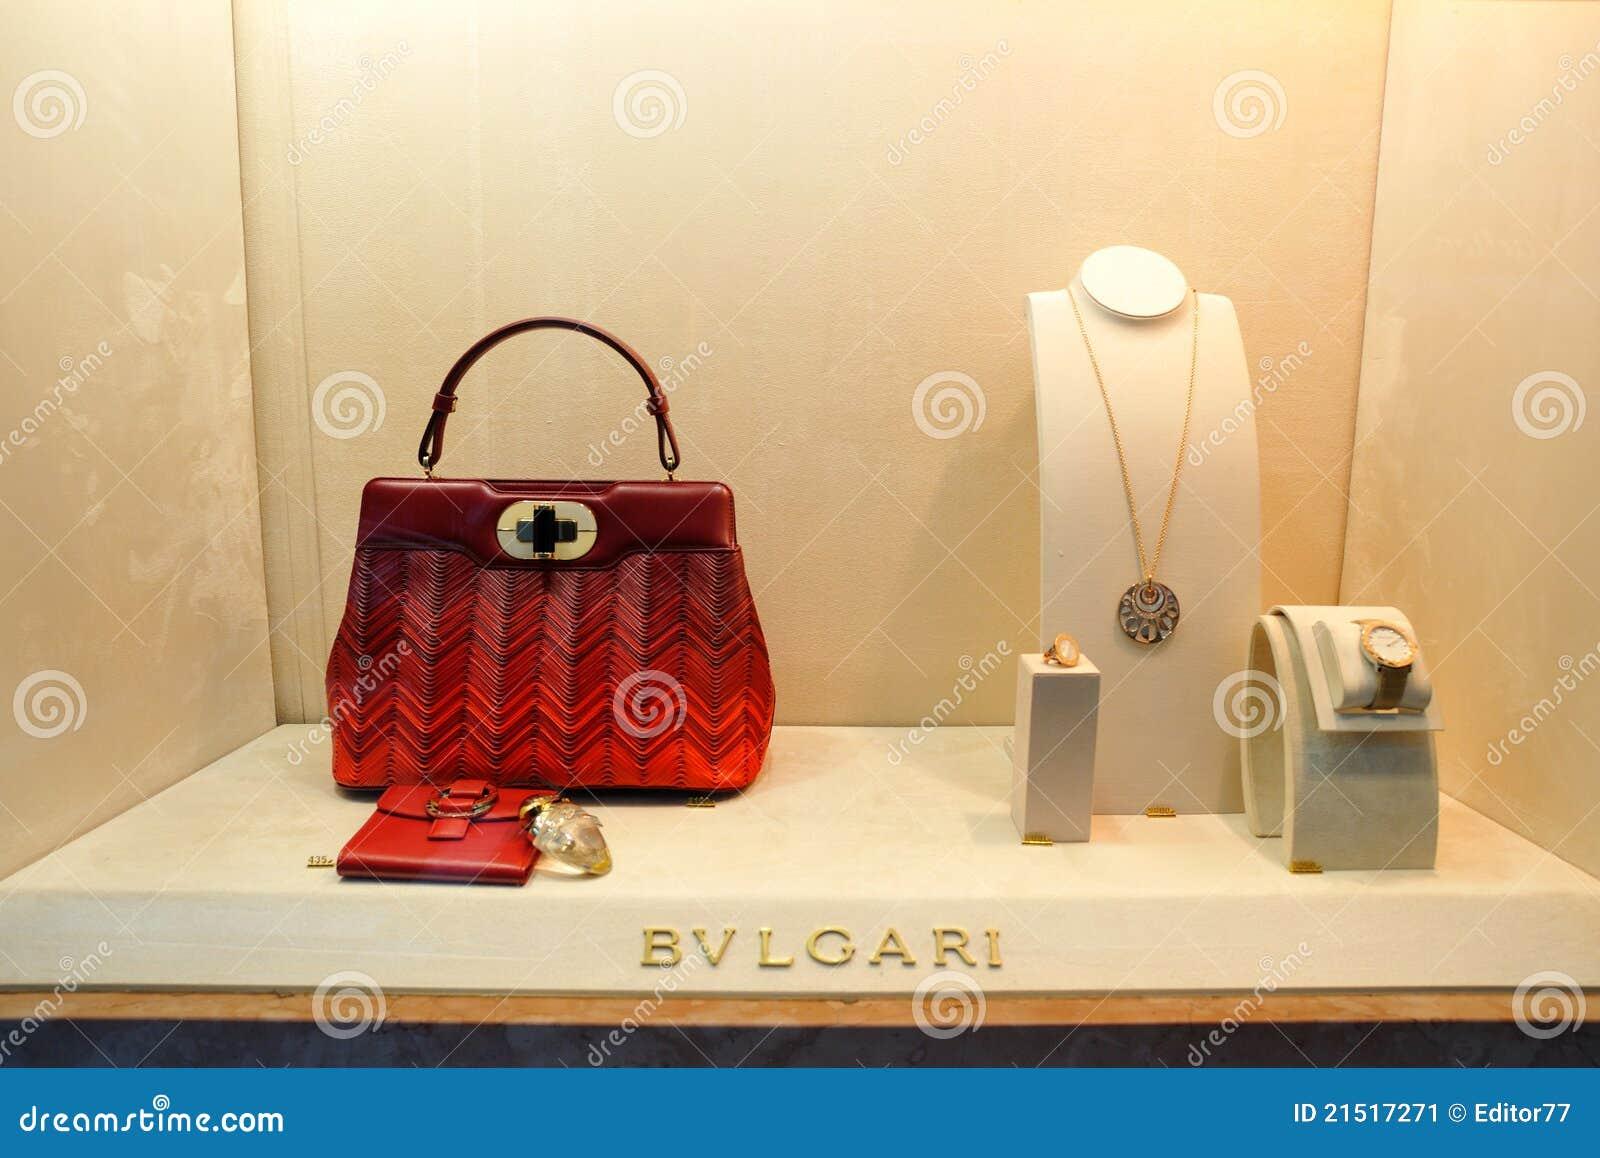 Bulgari luxury fashion store in Germany